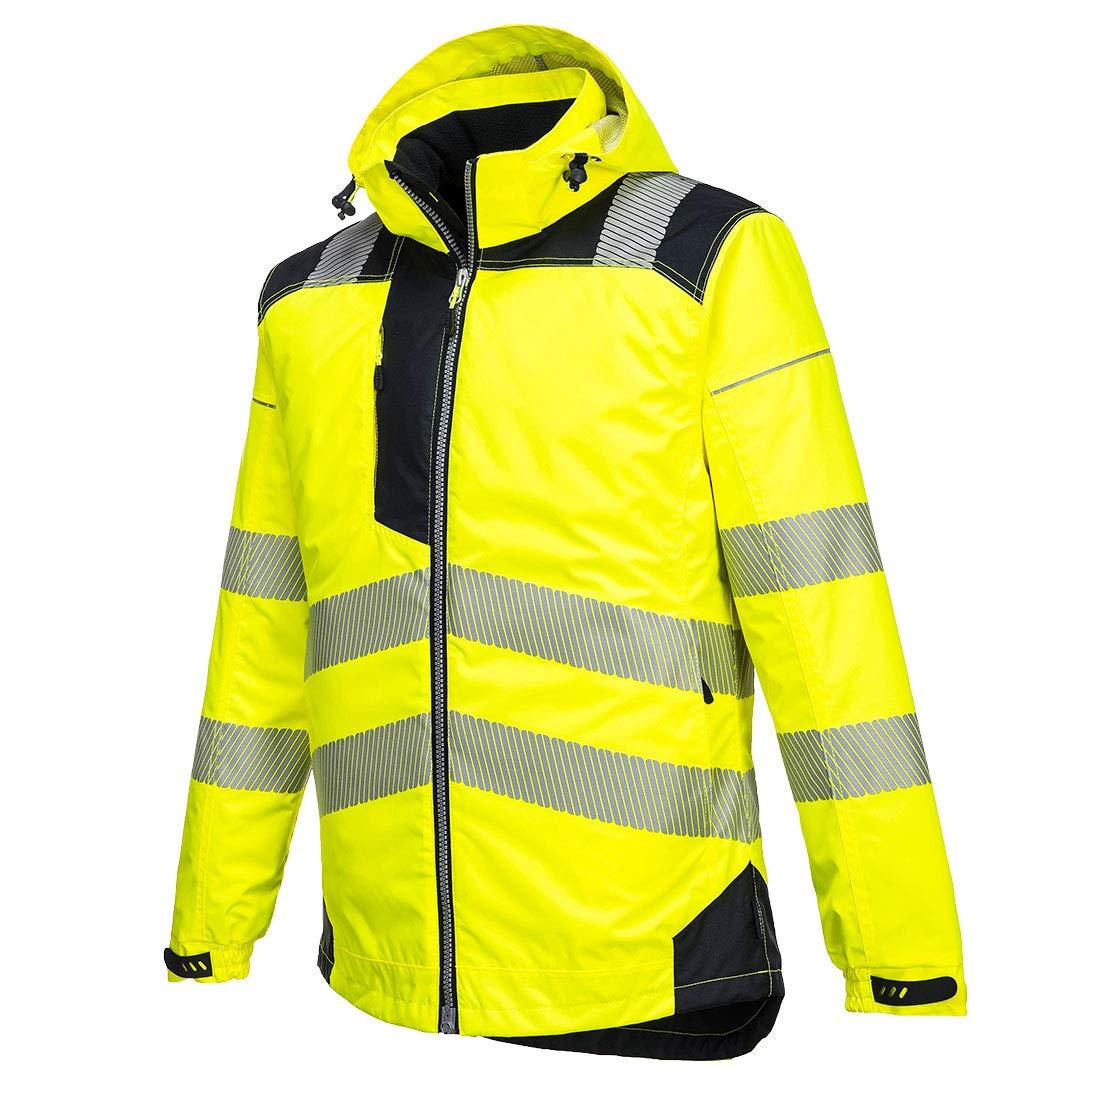 Portwest PW3 Hi-Vis Winter Jacket Work Safety Protective Reflective Waterproof Coat ANSI 3, XXL by Portwest (Image #3)